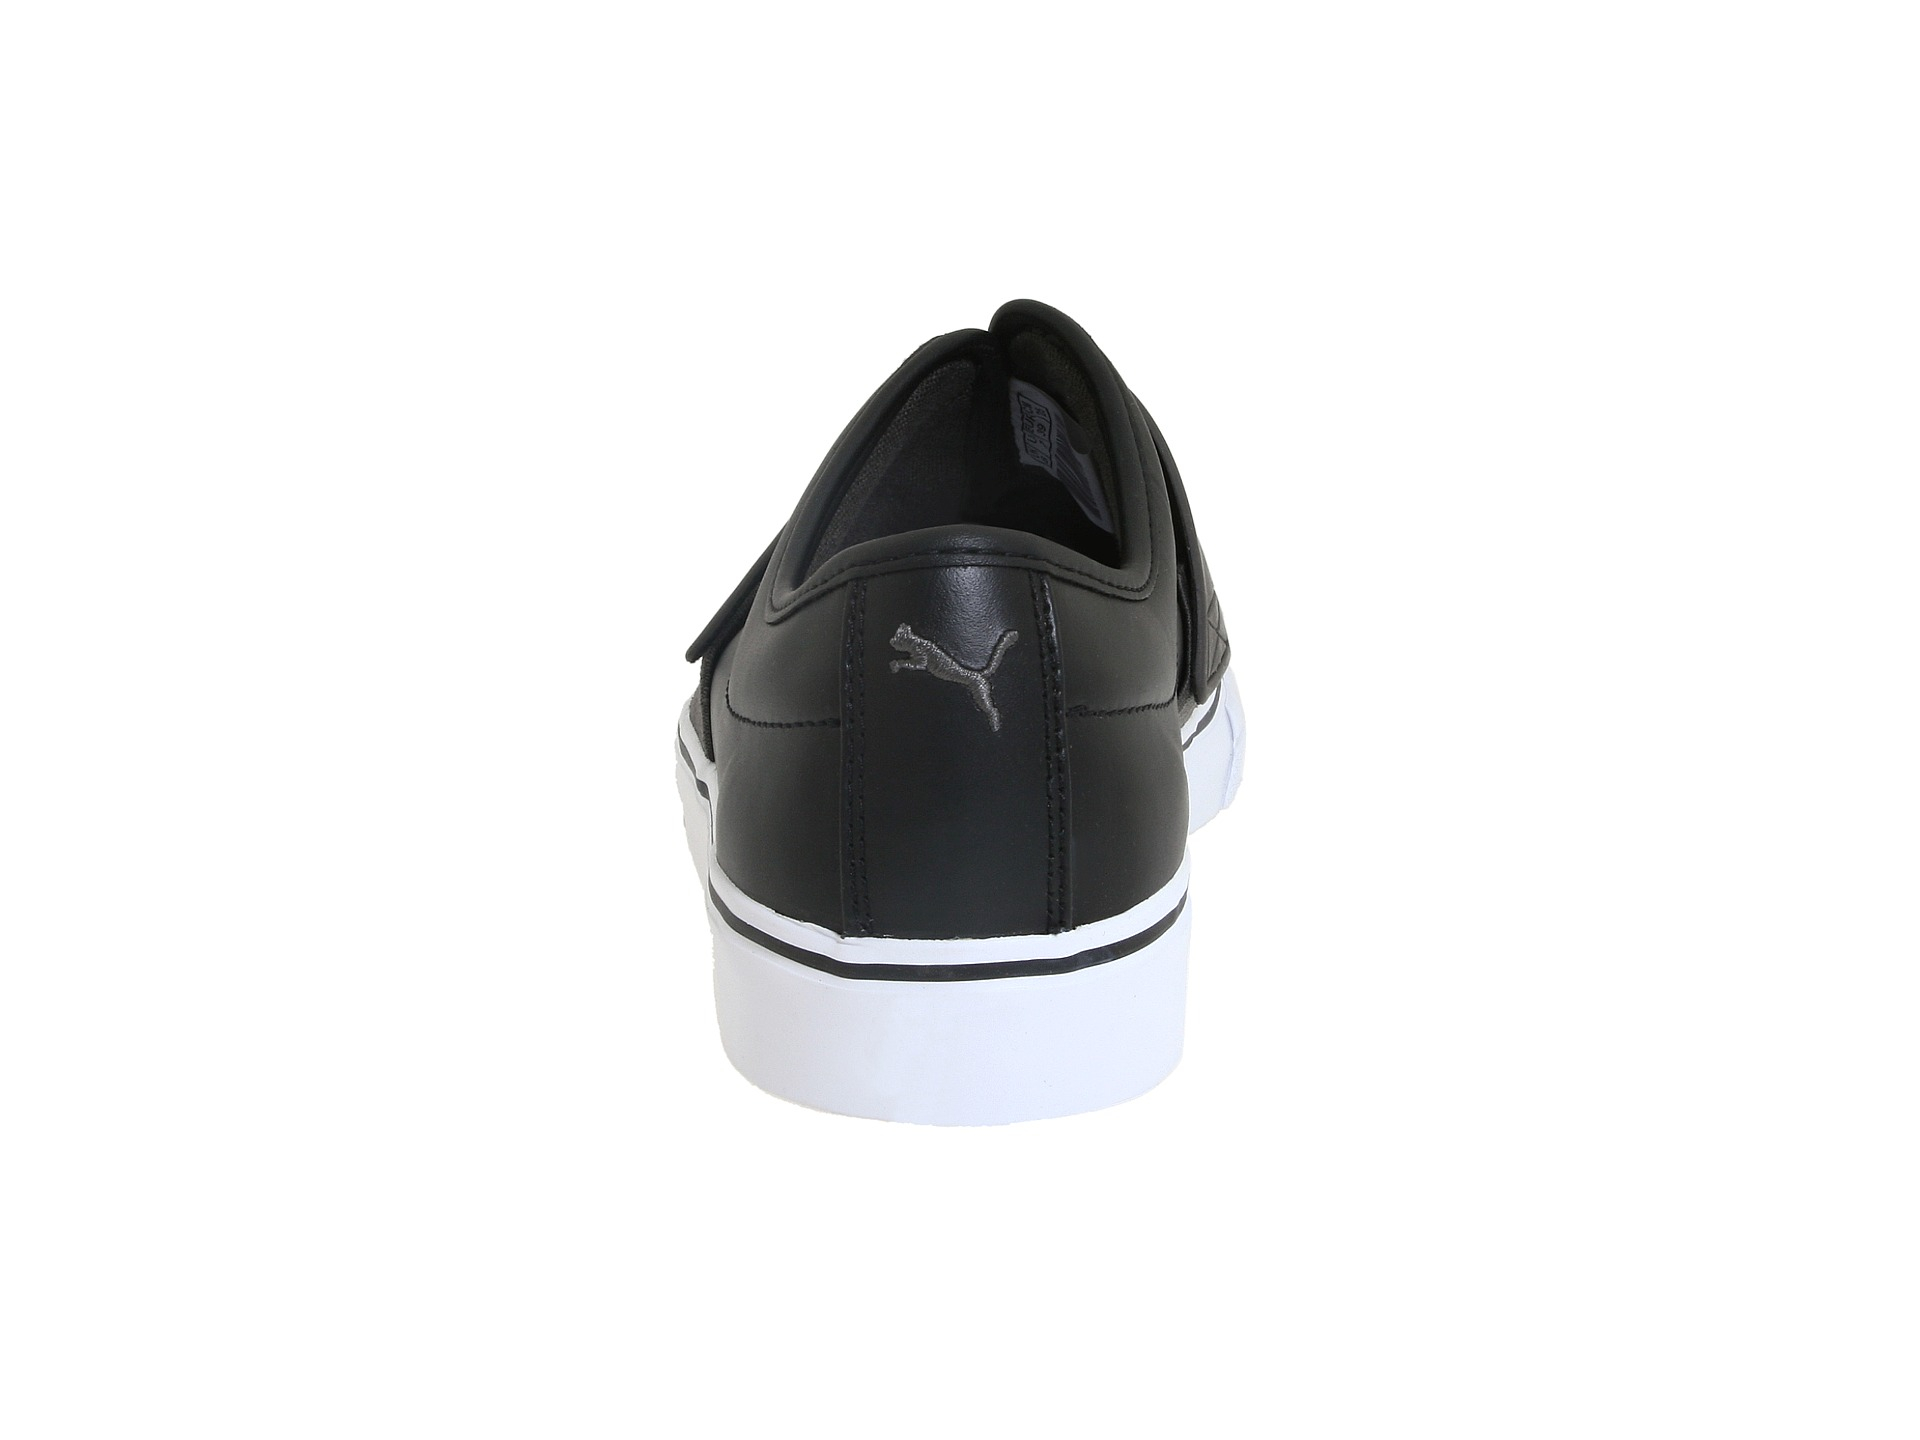 Lyst - PUMA El Rey Cross Perf L in Black for Men b8a8fc046